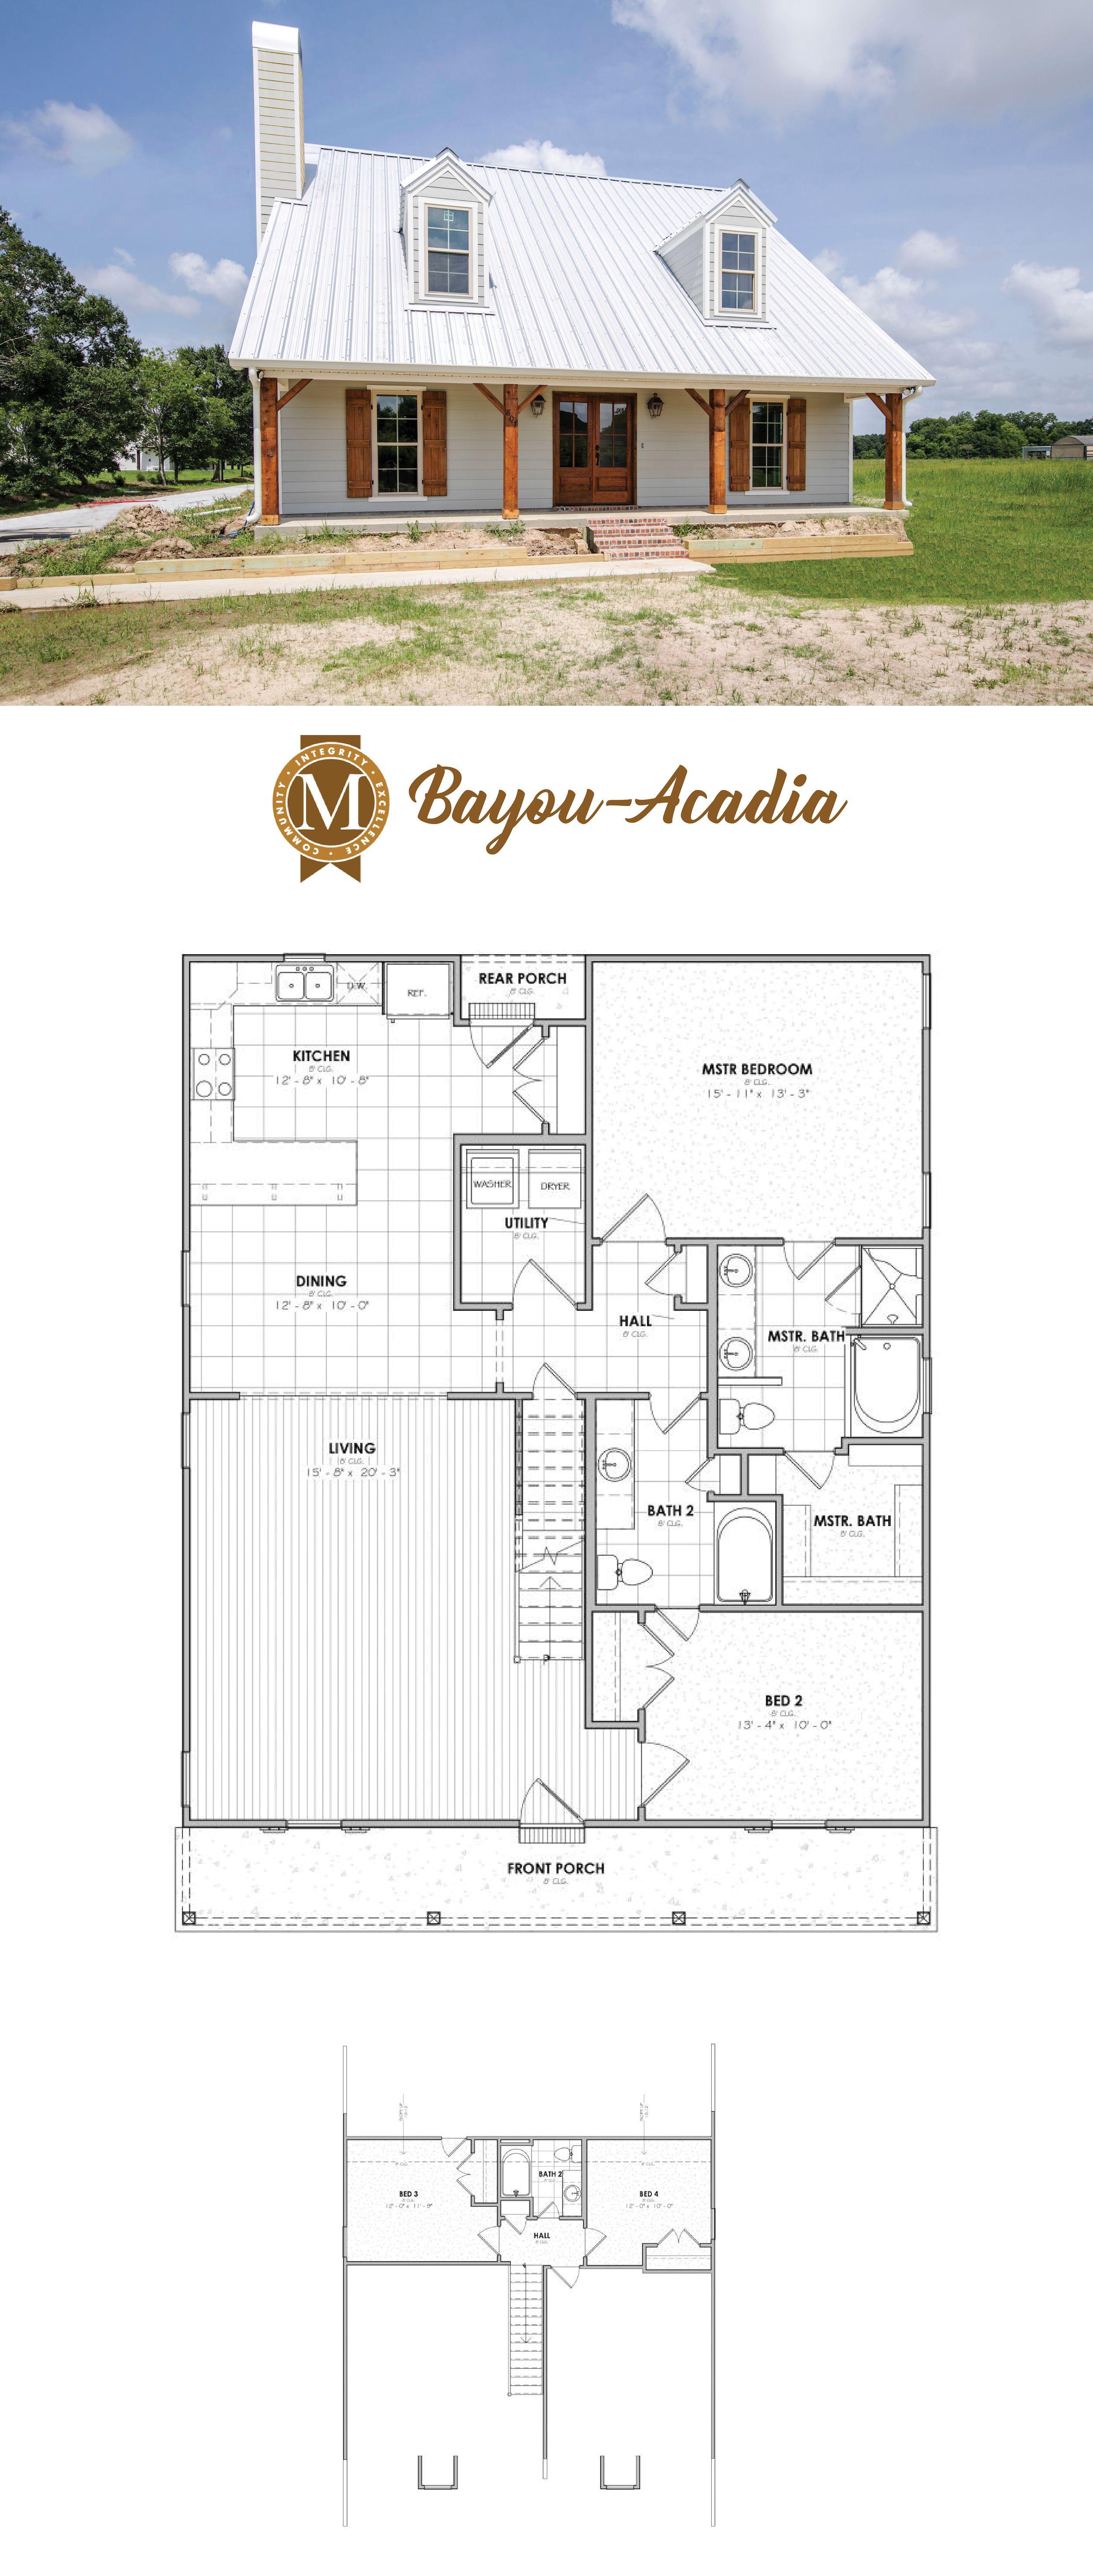 Lafayette Region Plan Acadia Bayou Living Square Feet